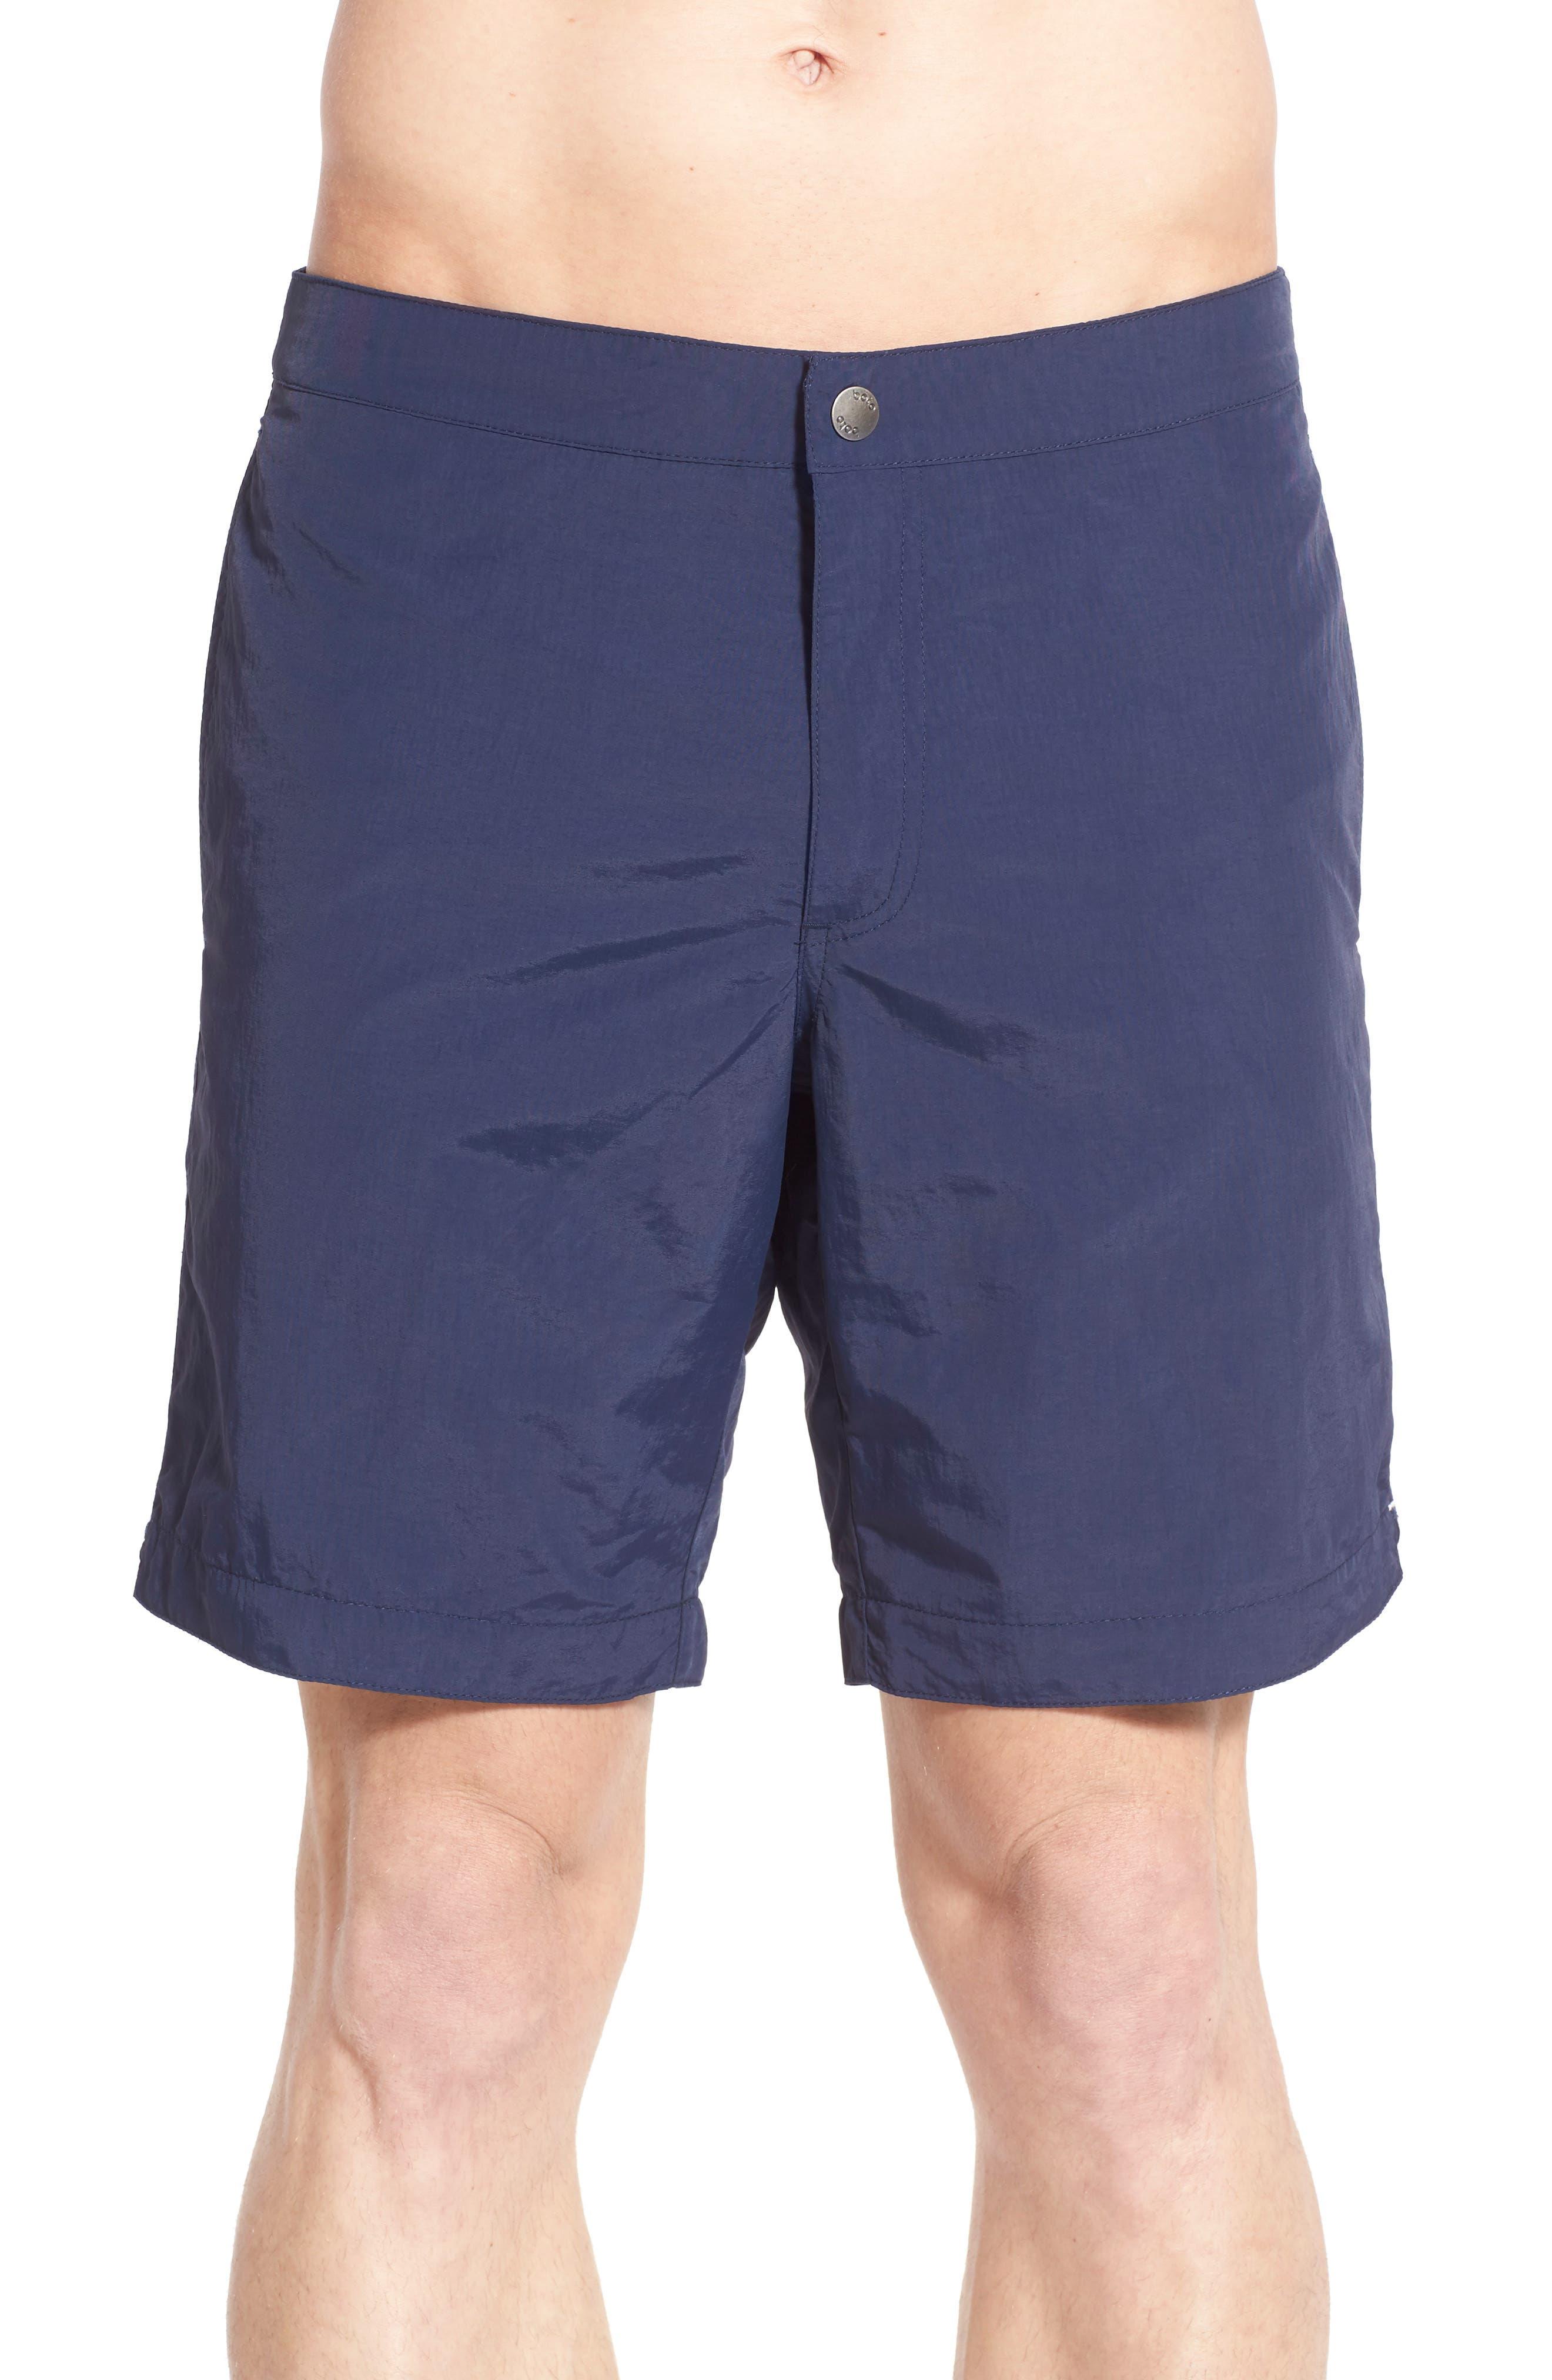 BOTO Aruba Tailored Fit 8.5 Inch Swim Trunks, Main, color, DEEP NAVY BLUE